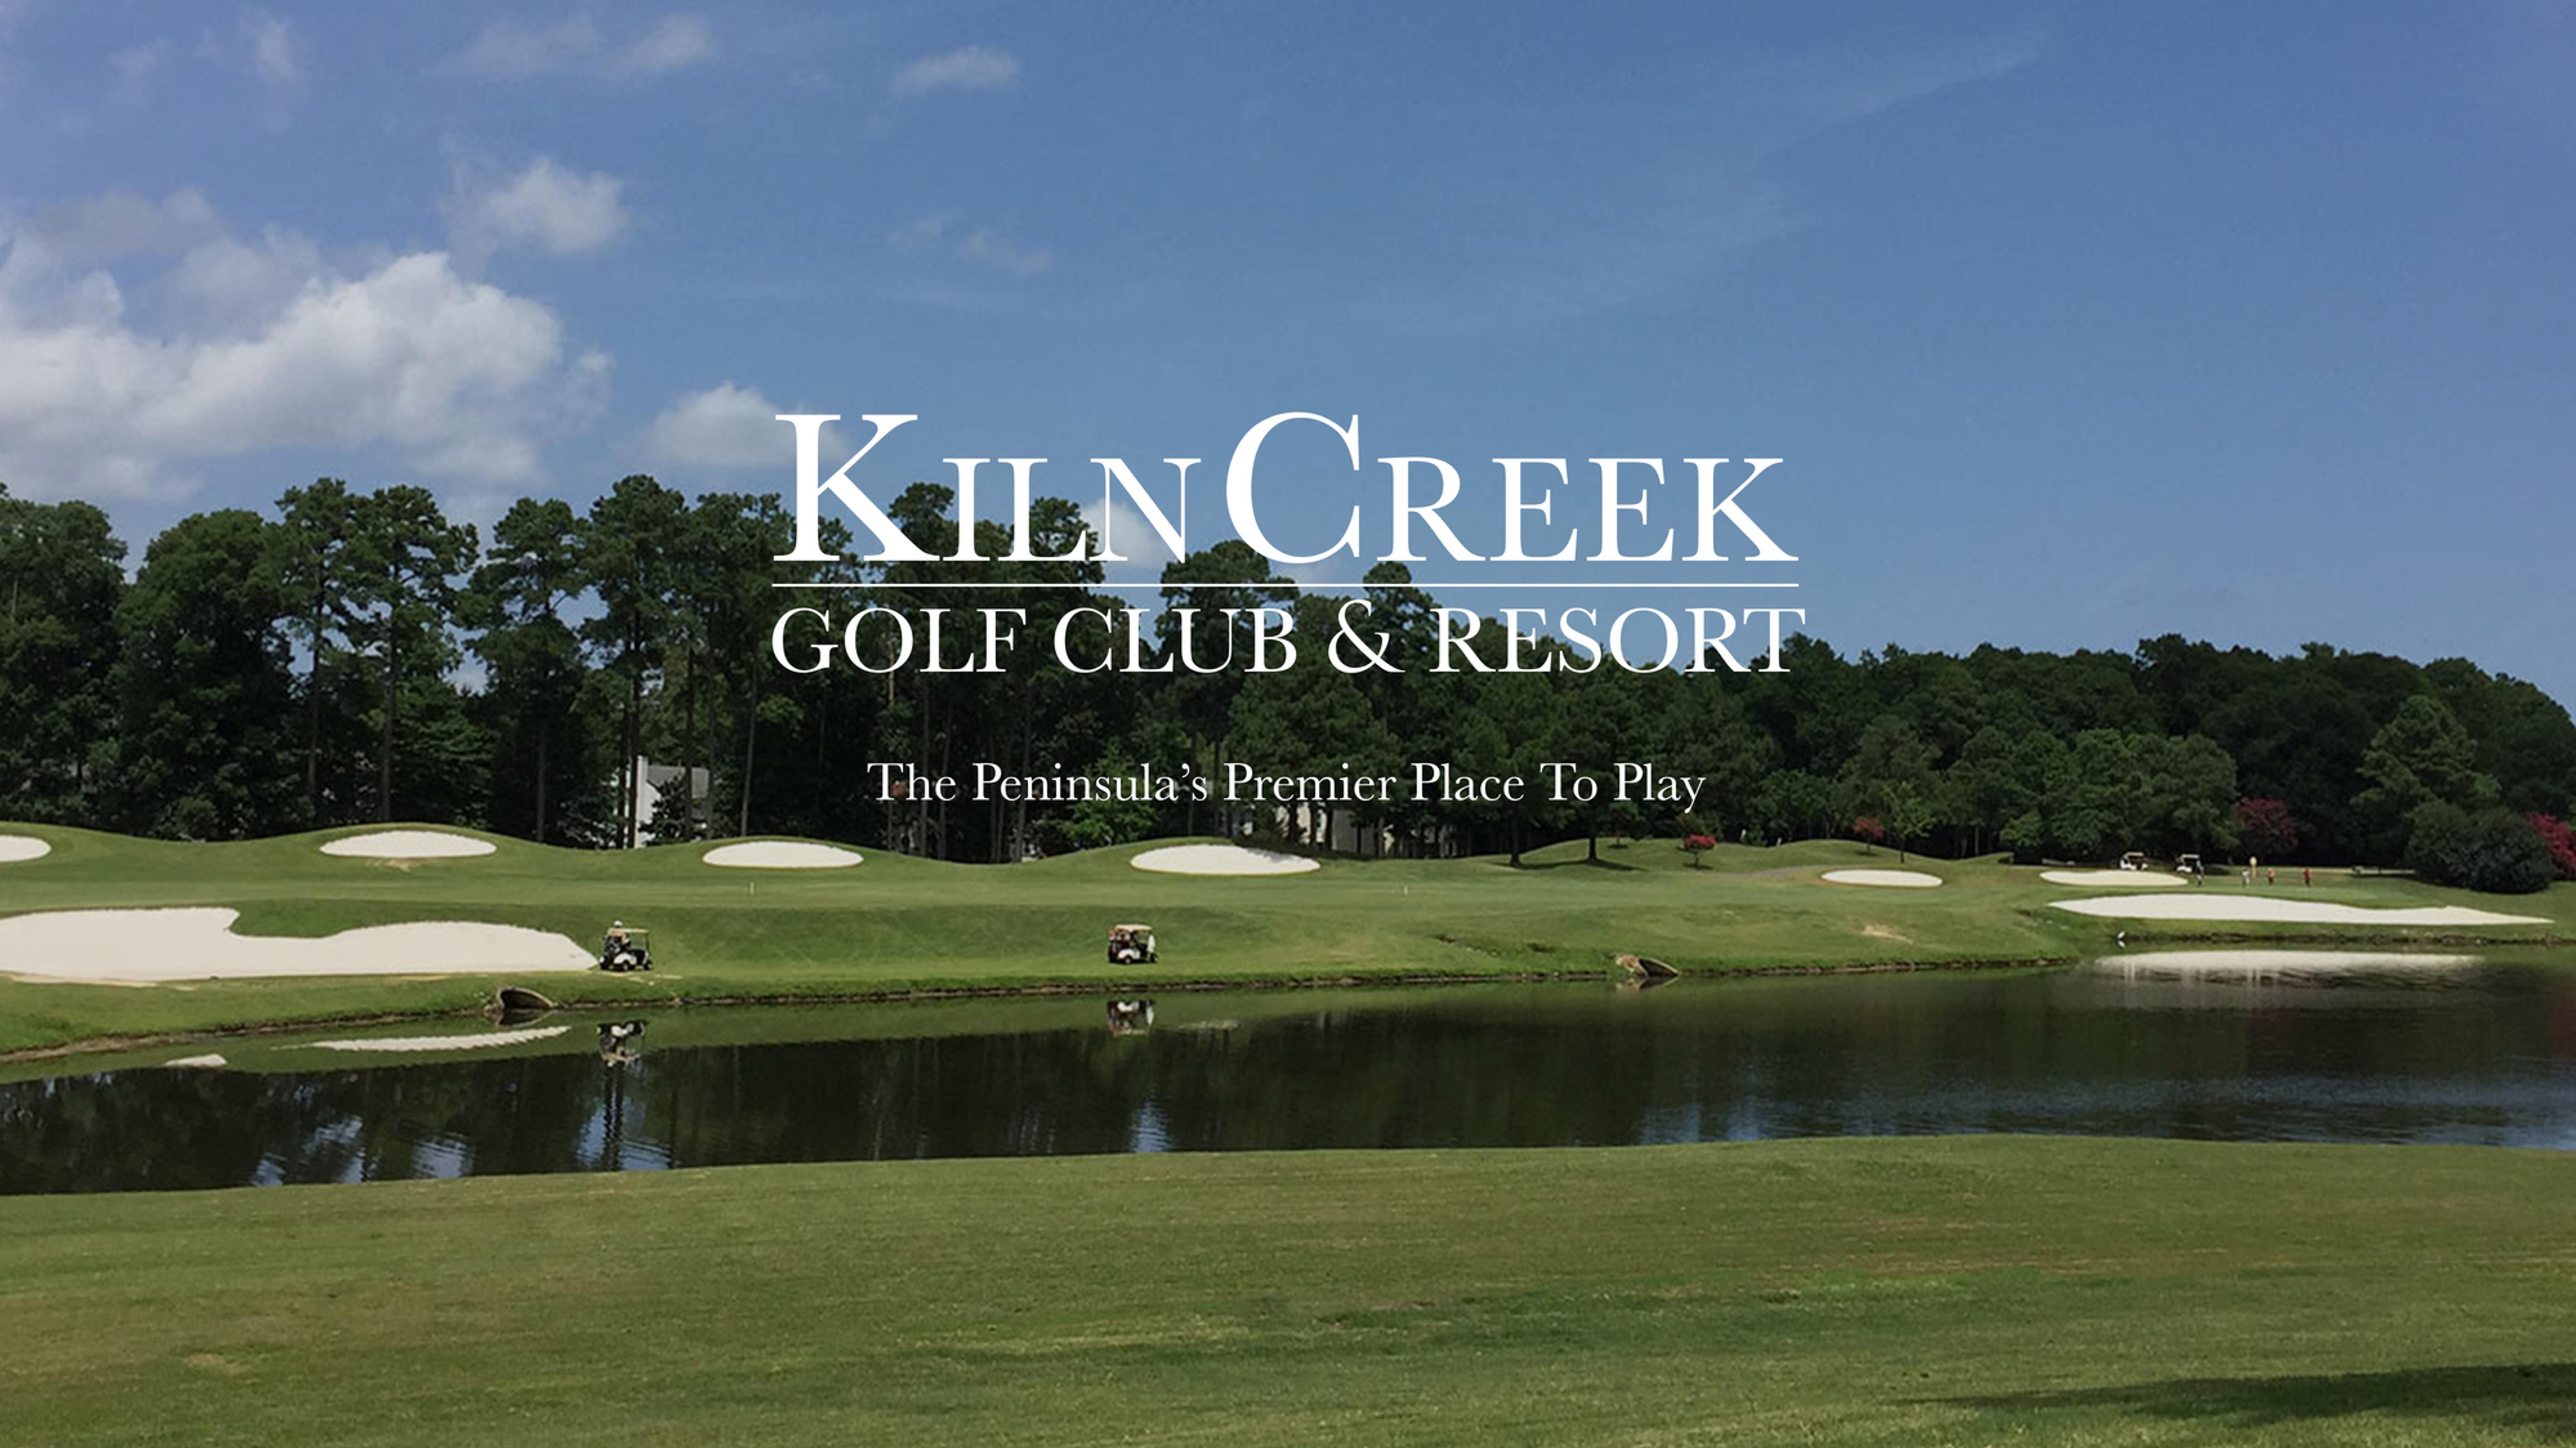 Kiln Creek Golf Club and Resort logo